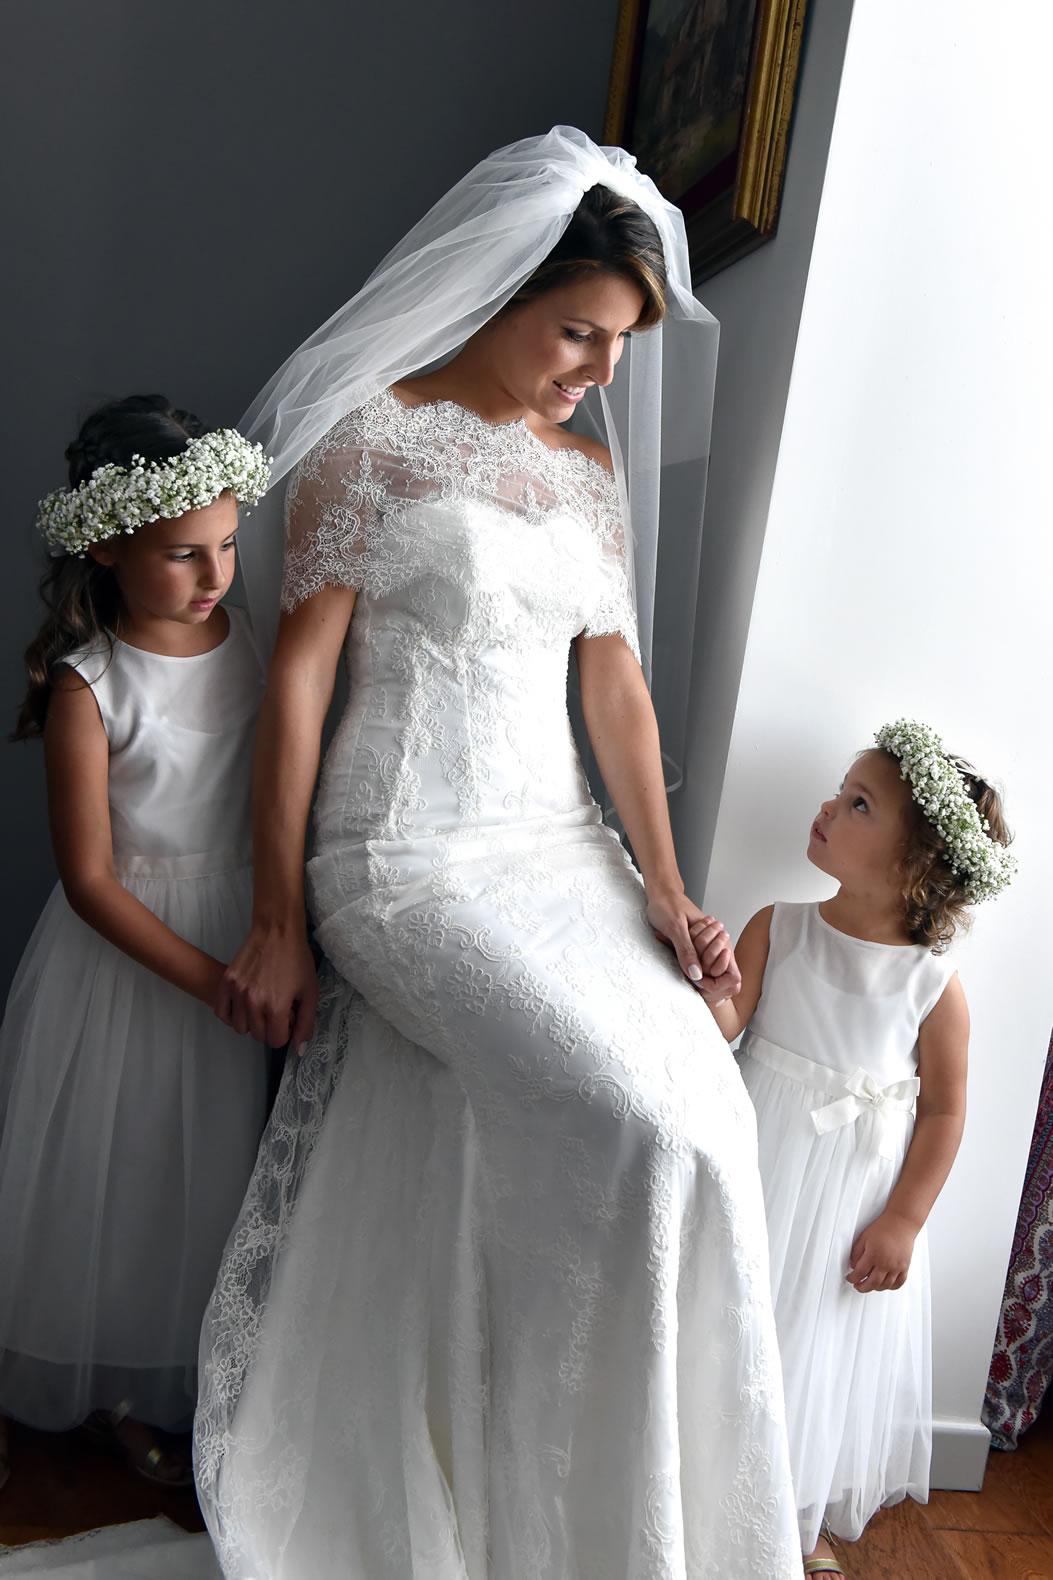 fotografo-matrimonio-napoli-31